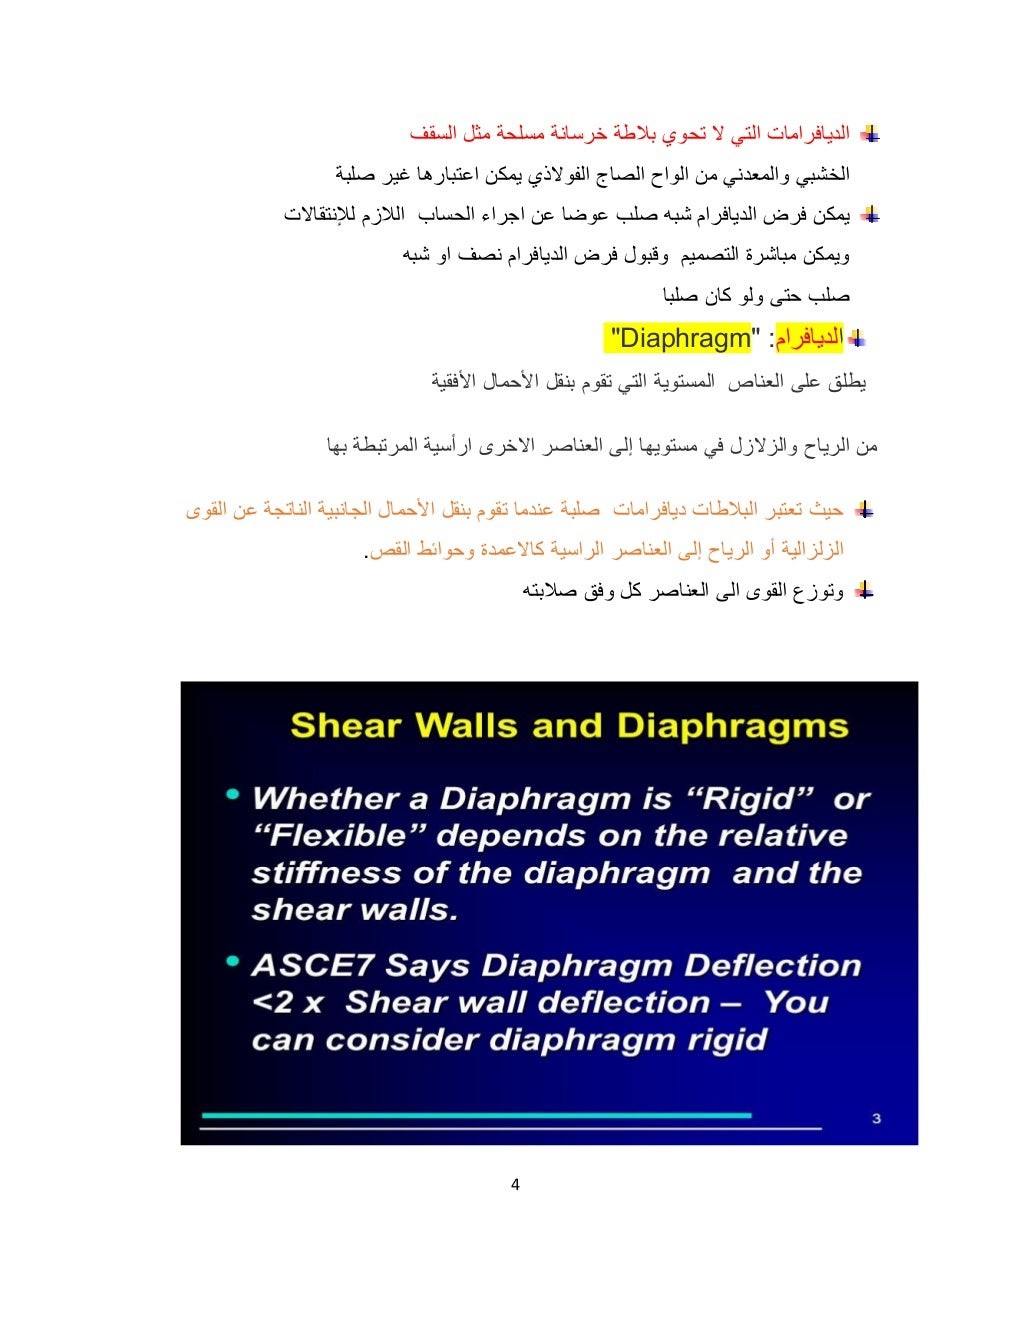 rigid-semi-rigid-flexible-diaphragm-for-seismic-analysis-4-1024.jpg